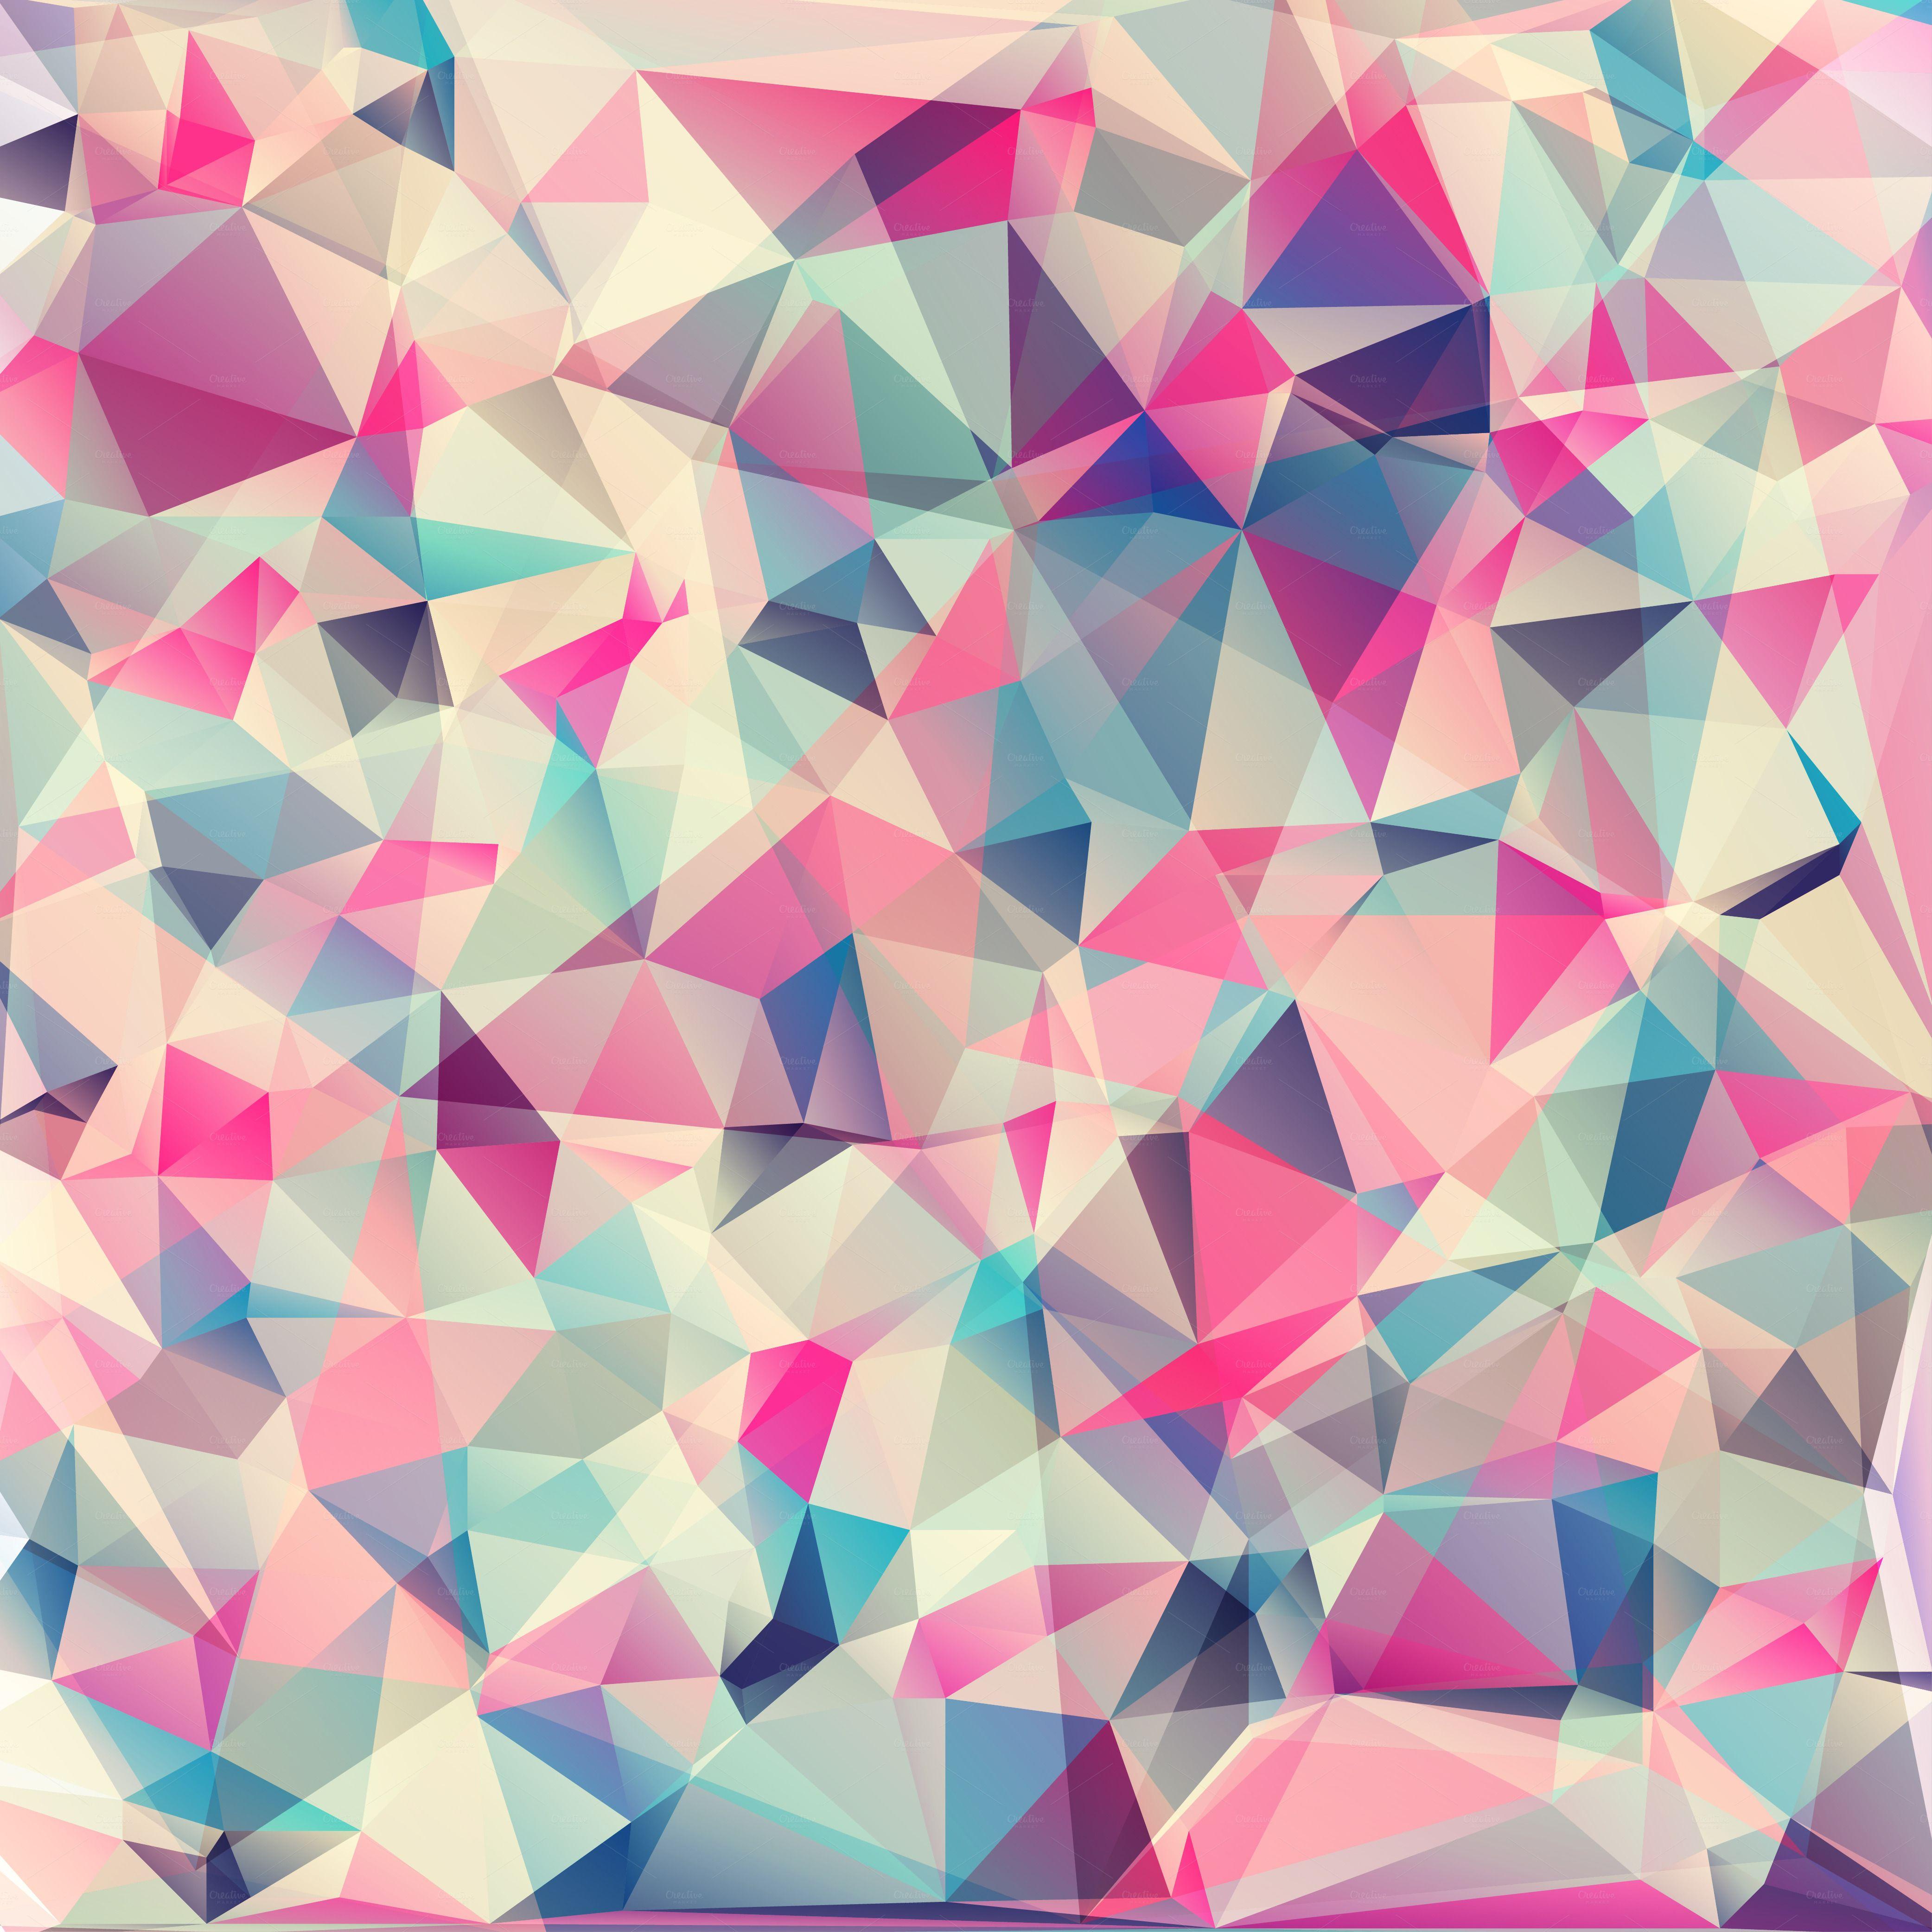 Geometric Background | Backgrounds, Geometric background and Creative